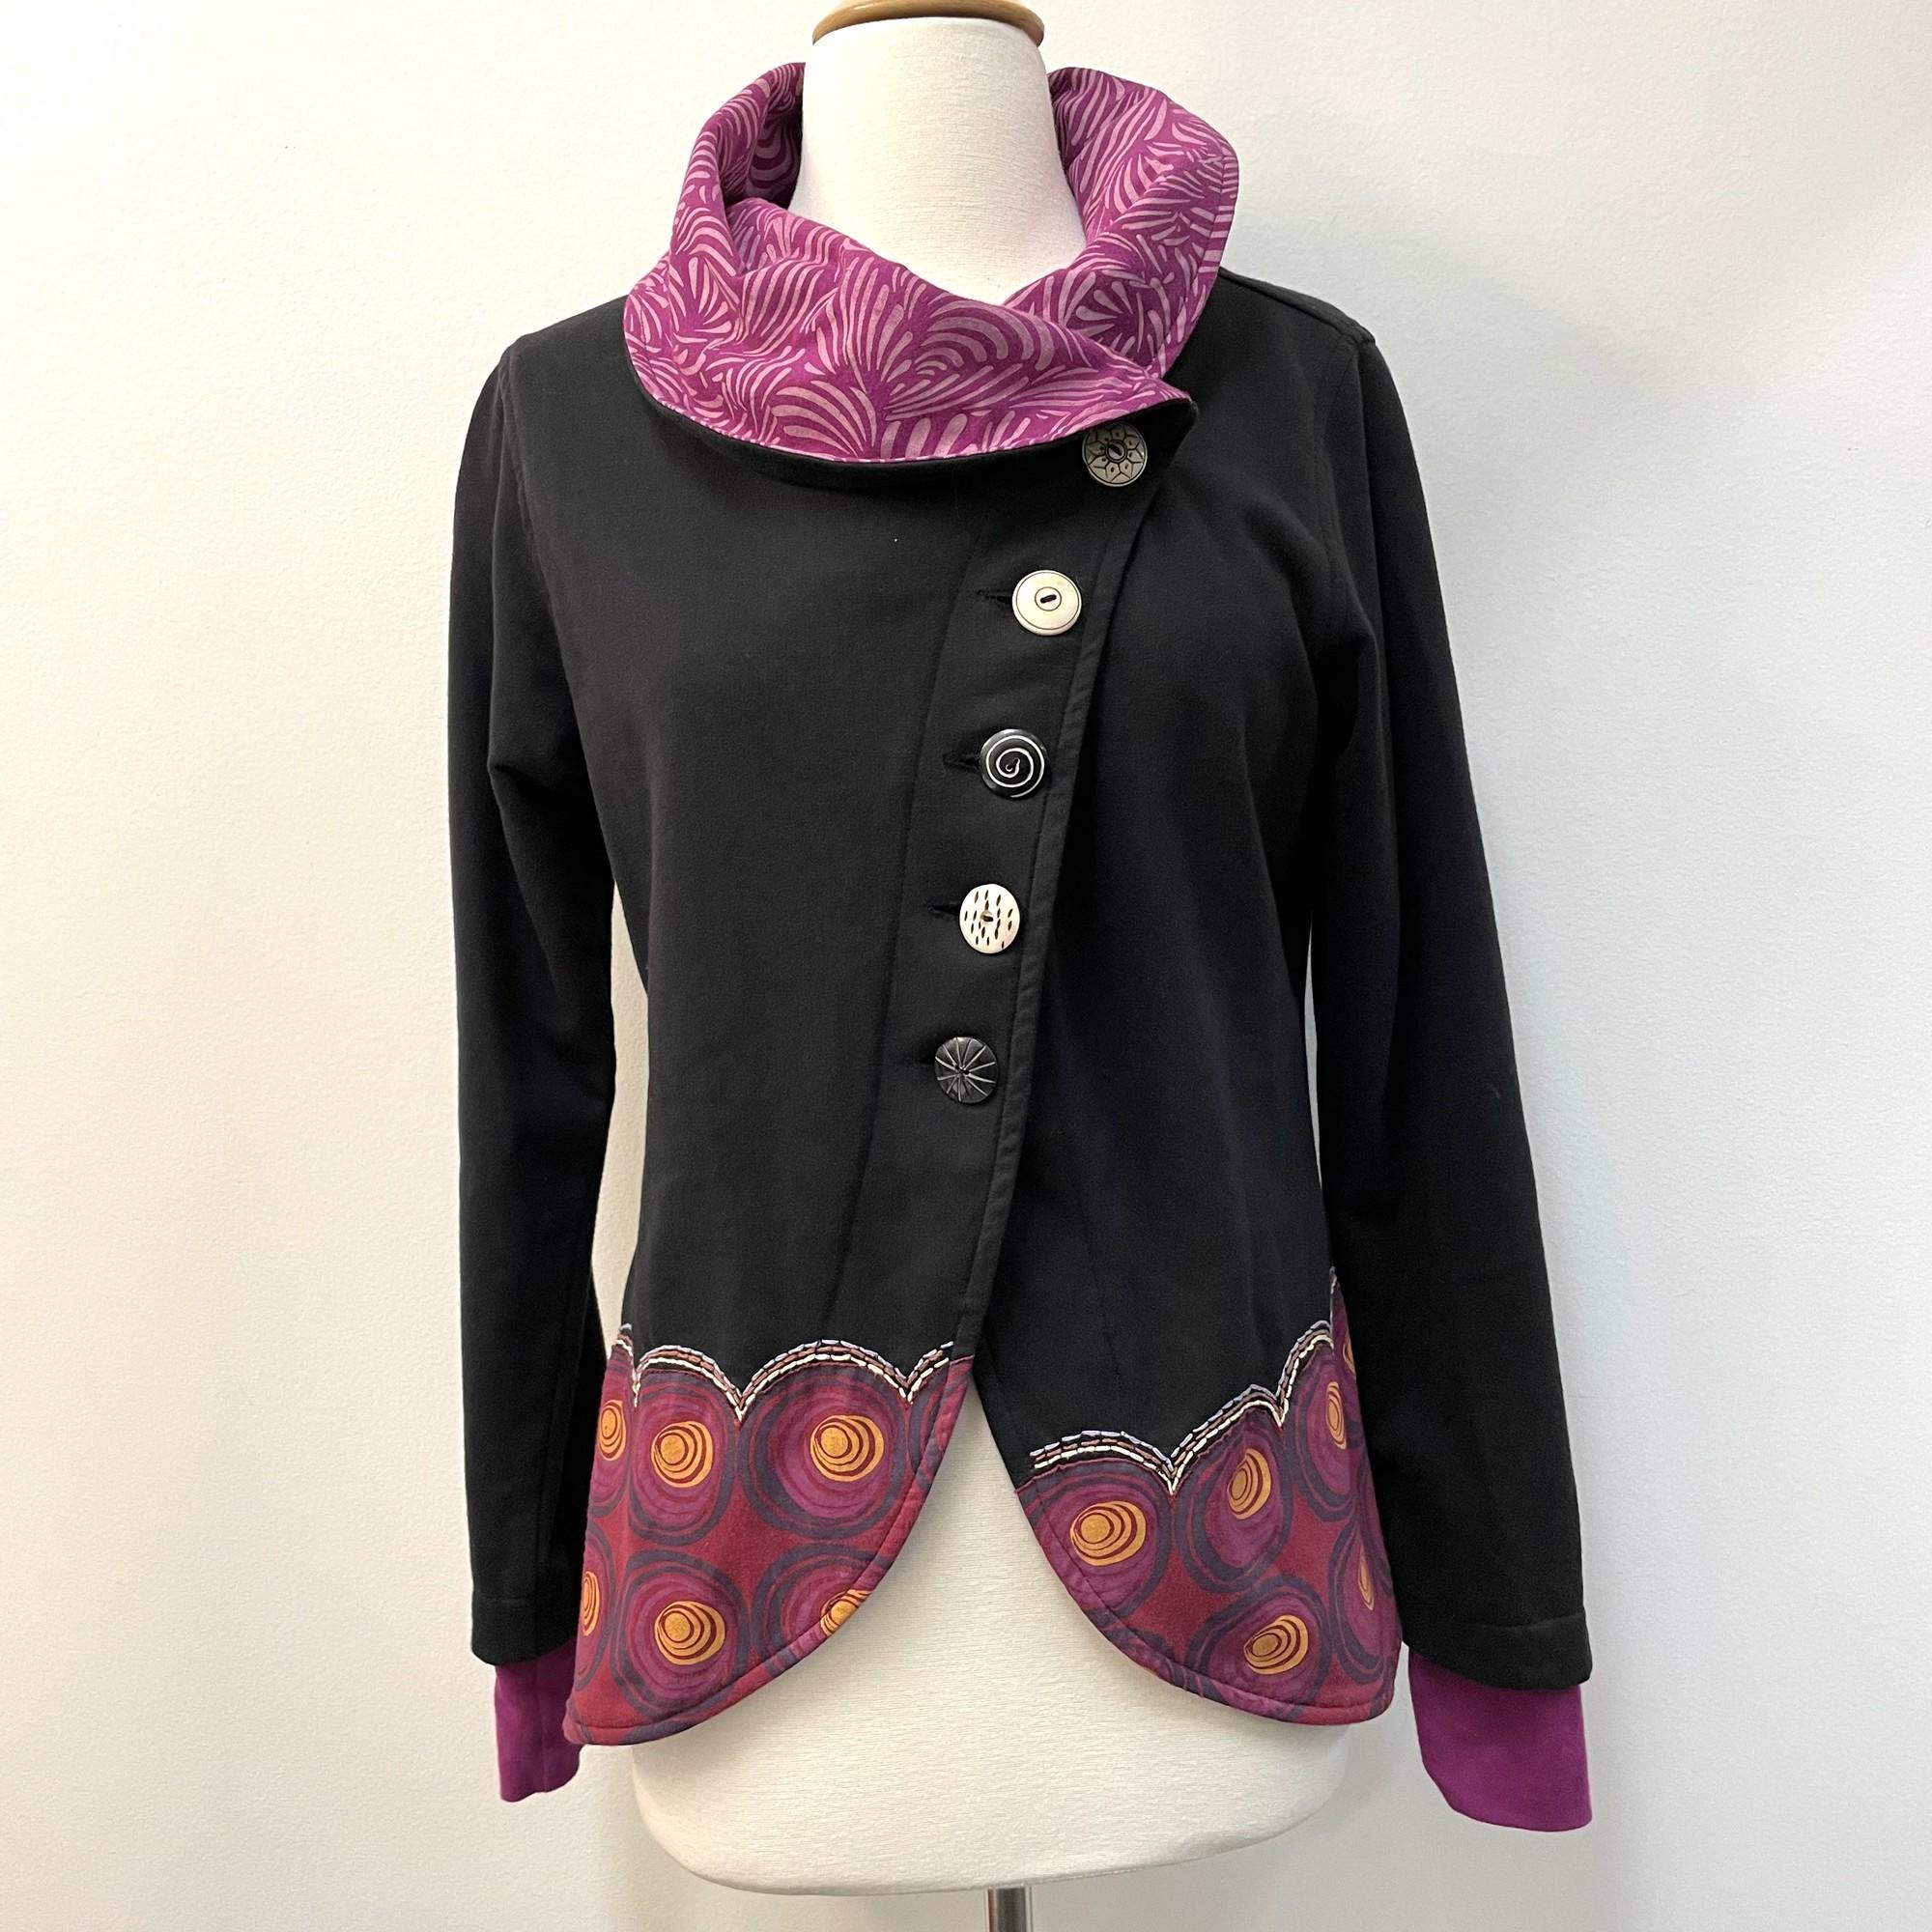 Adriamode Jacket<br /> Black, Purple, and Orange<br /> Size: Small